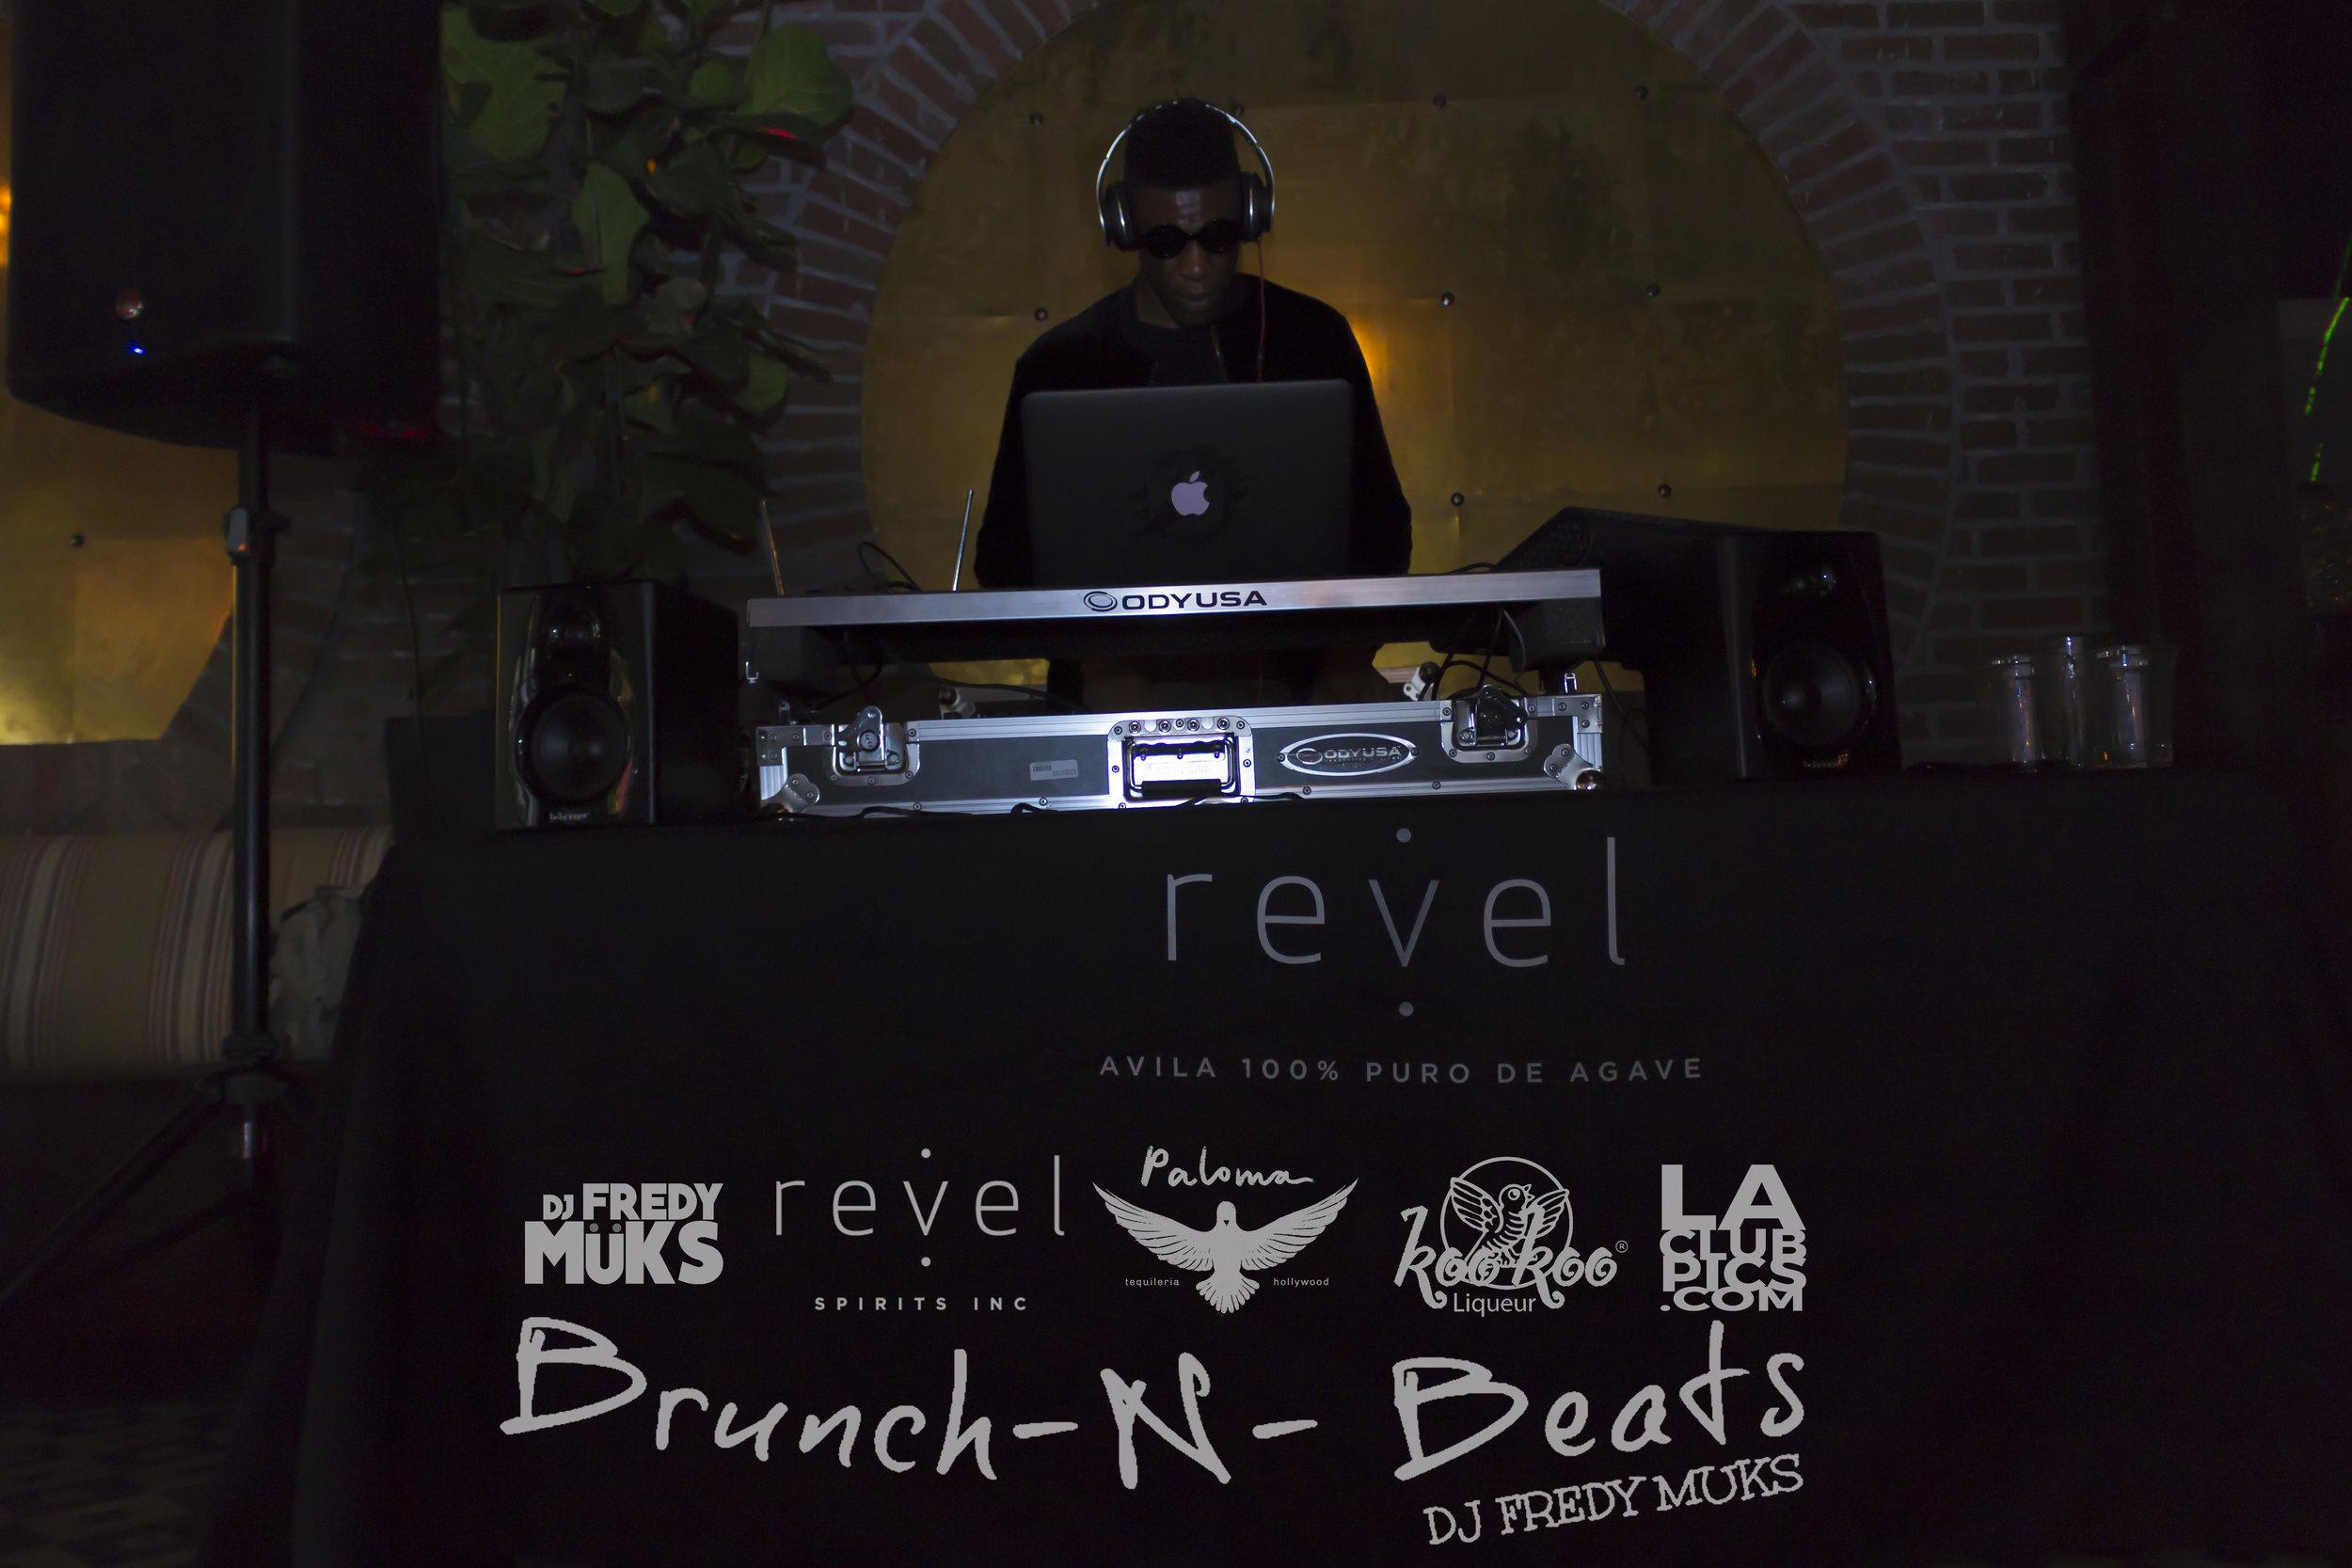 Brunch-N-Beats - Paloma Hollywood - 02-25-18_196.jpg